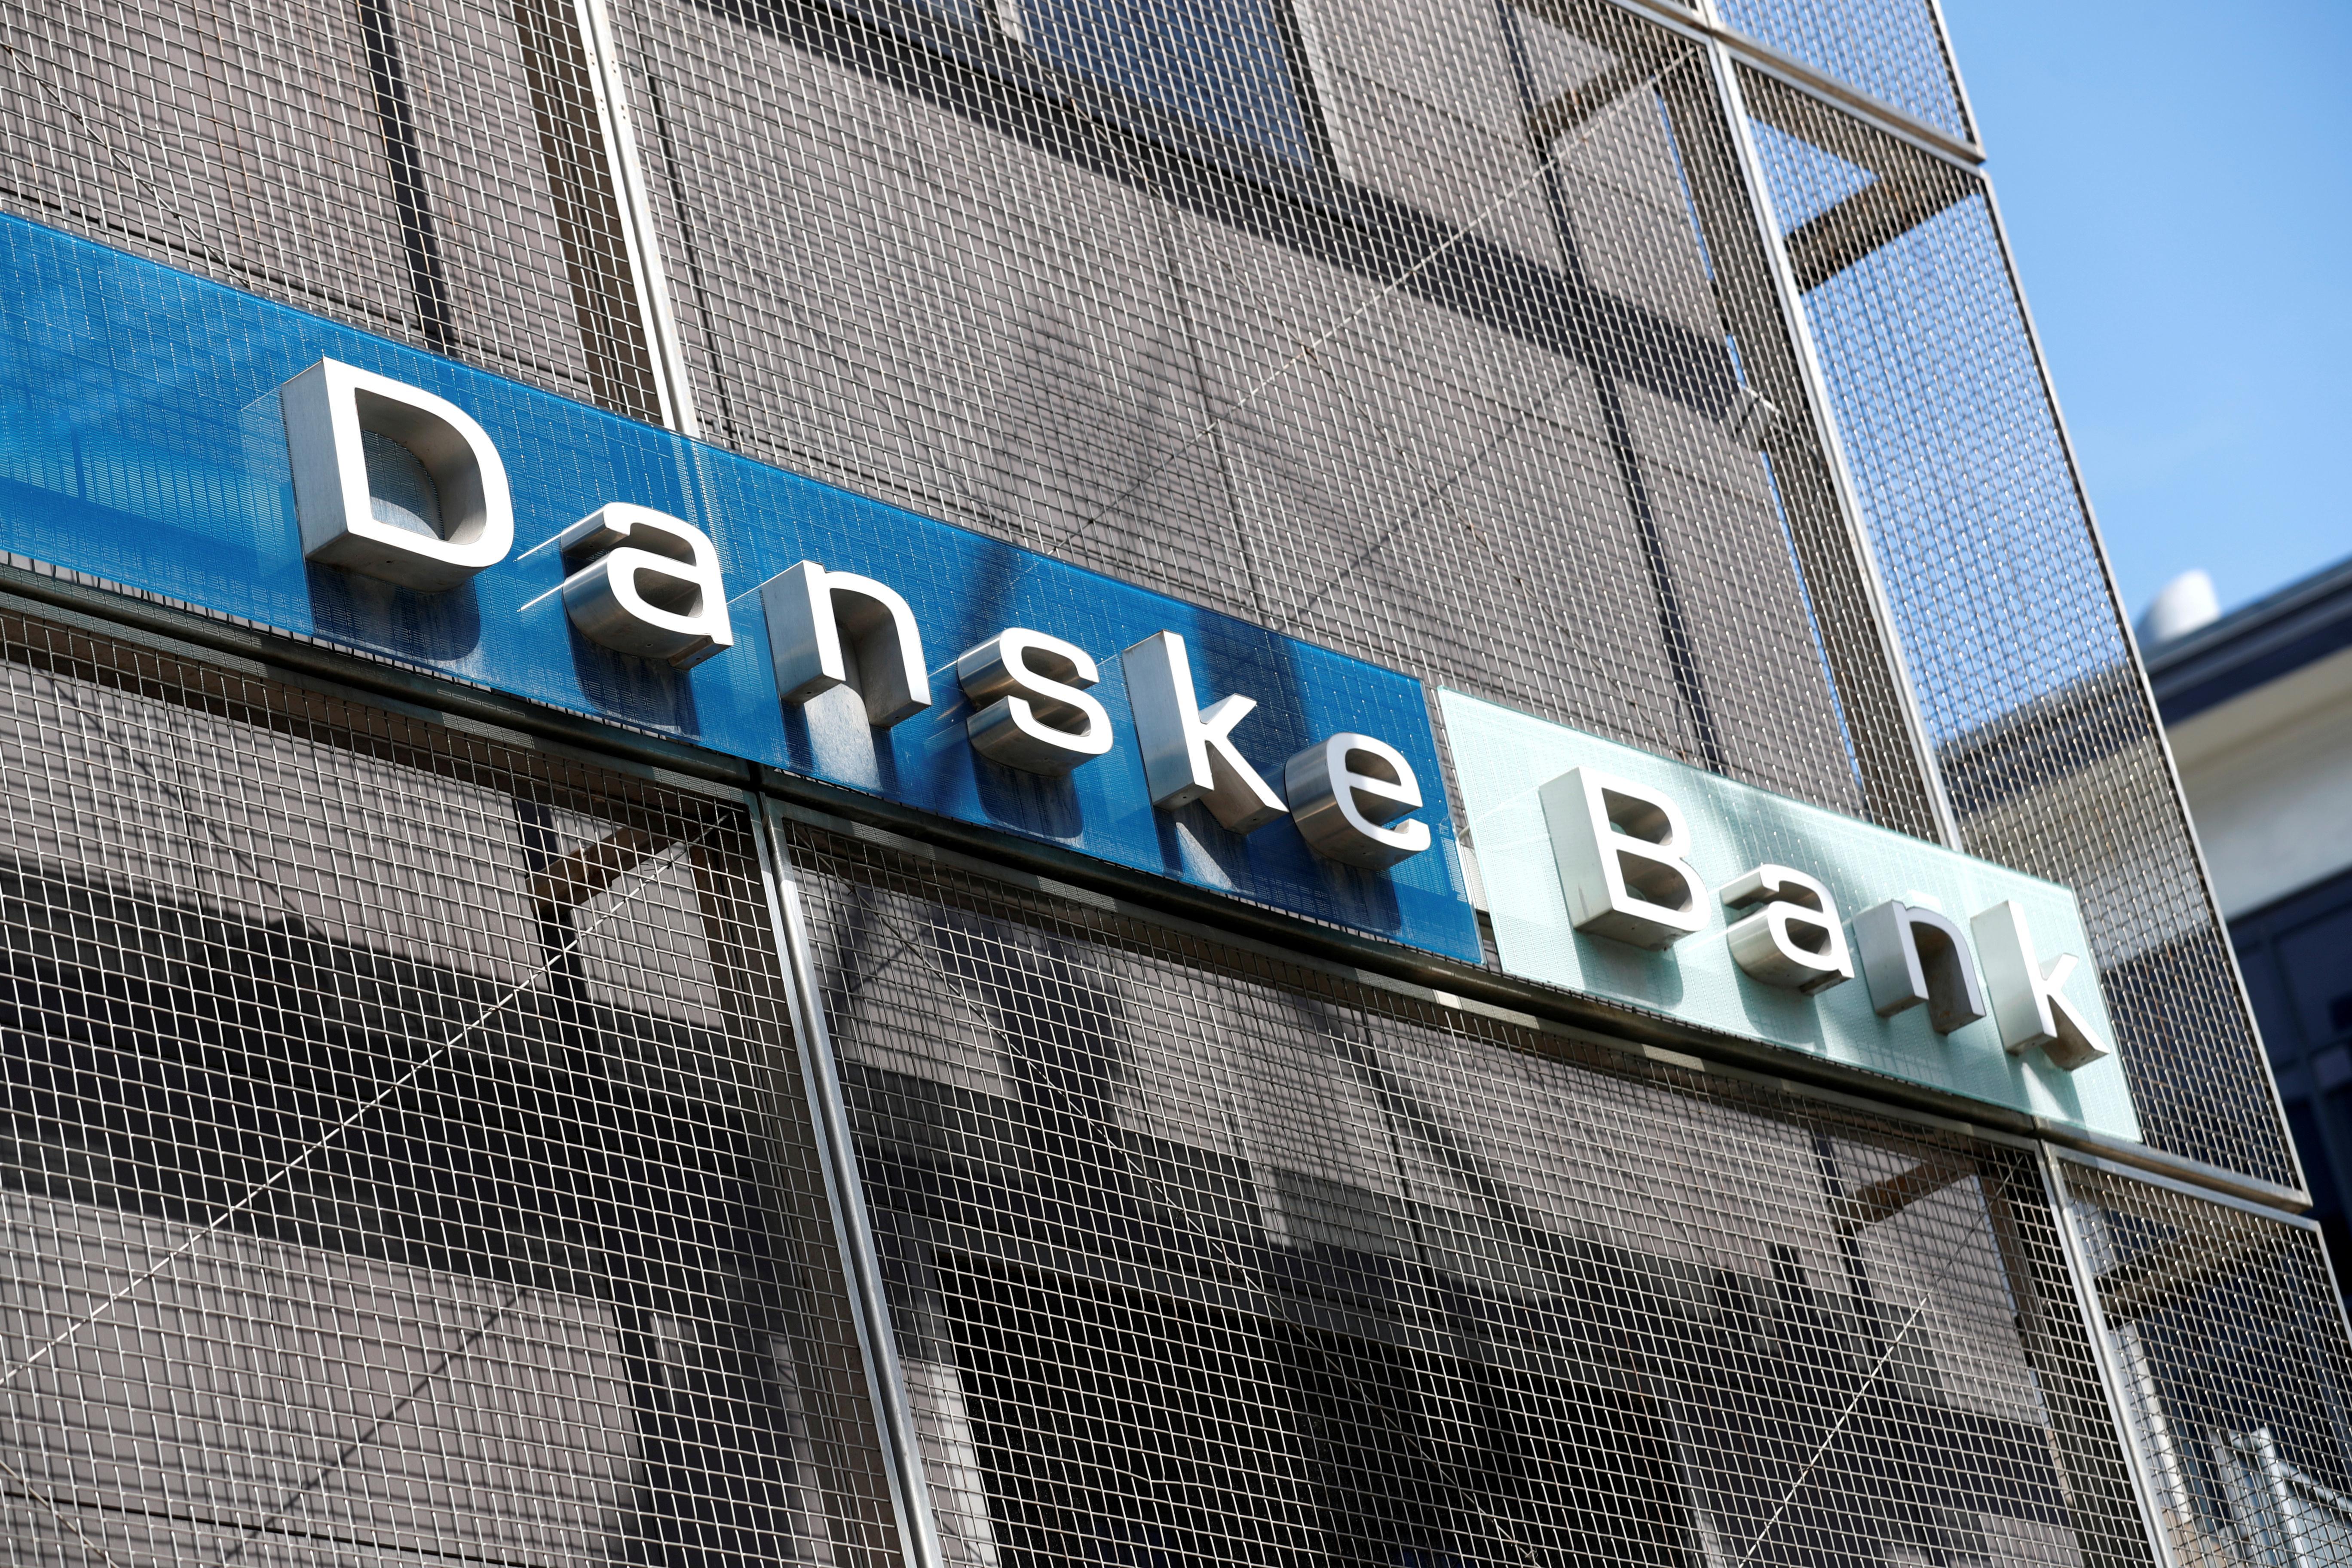 Danske Bank stops hiring new staff amid higher compliance costs